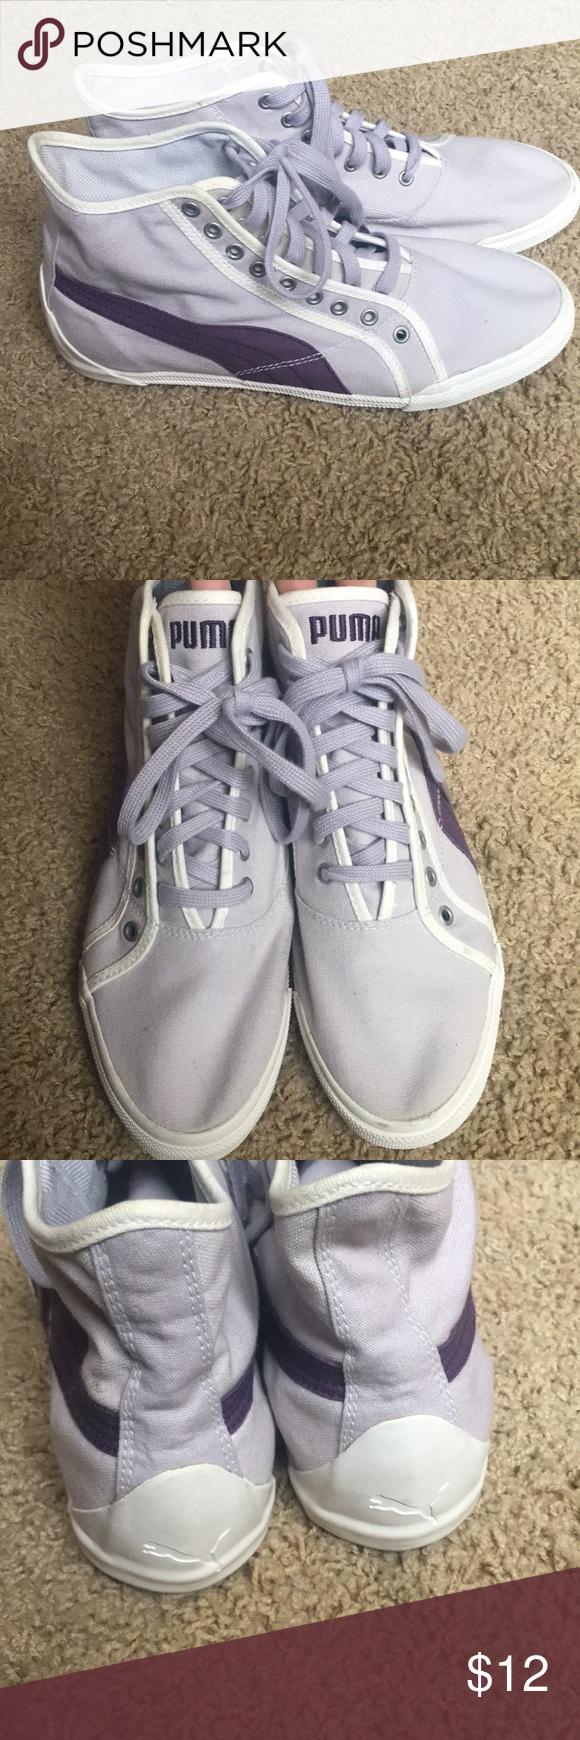 Purple Puma High-Top Sneakers (size